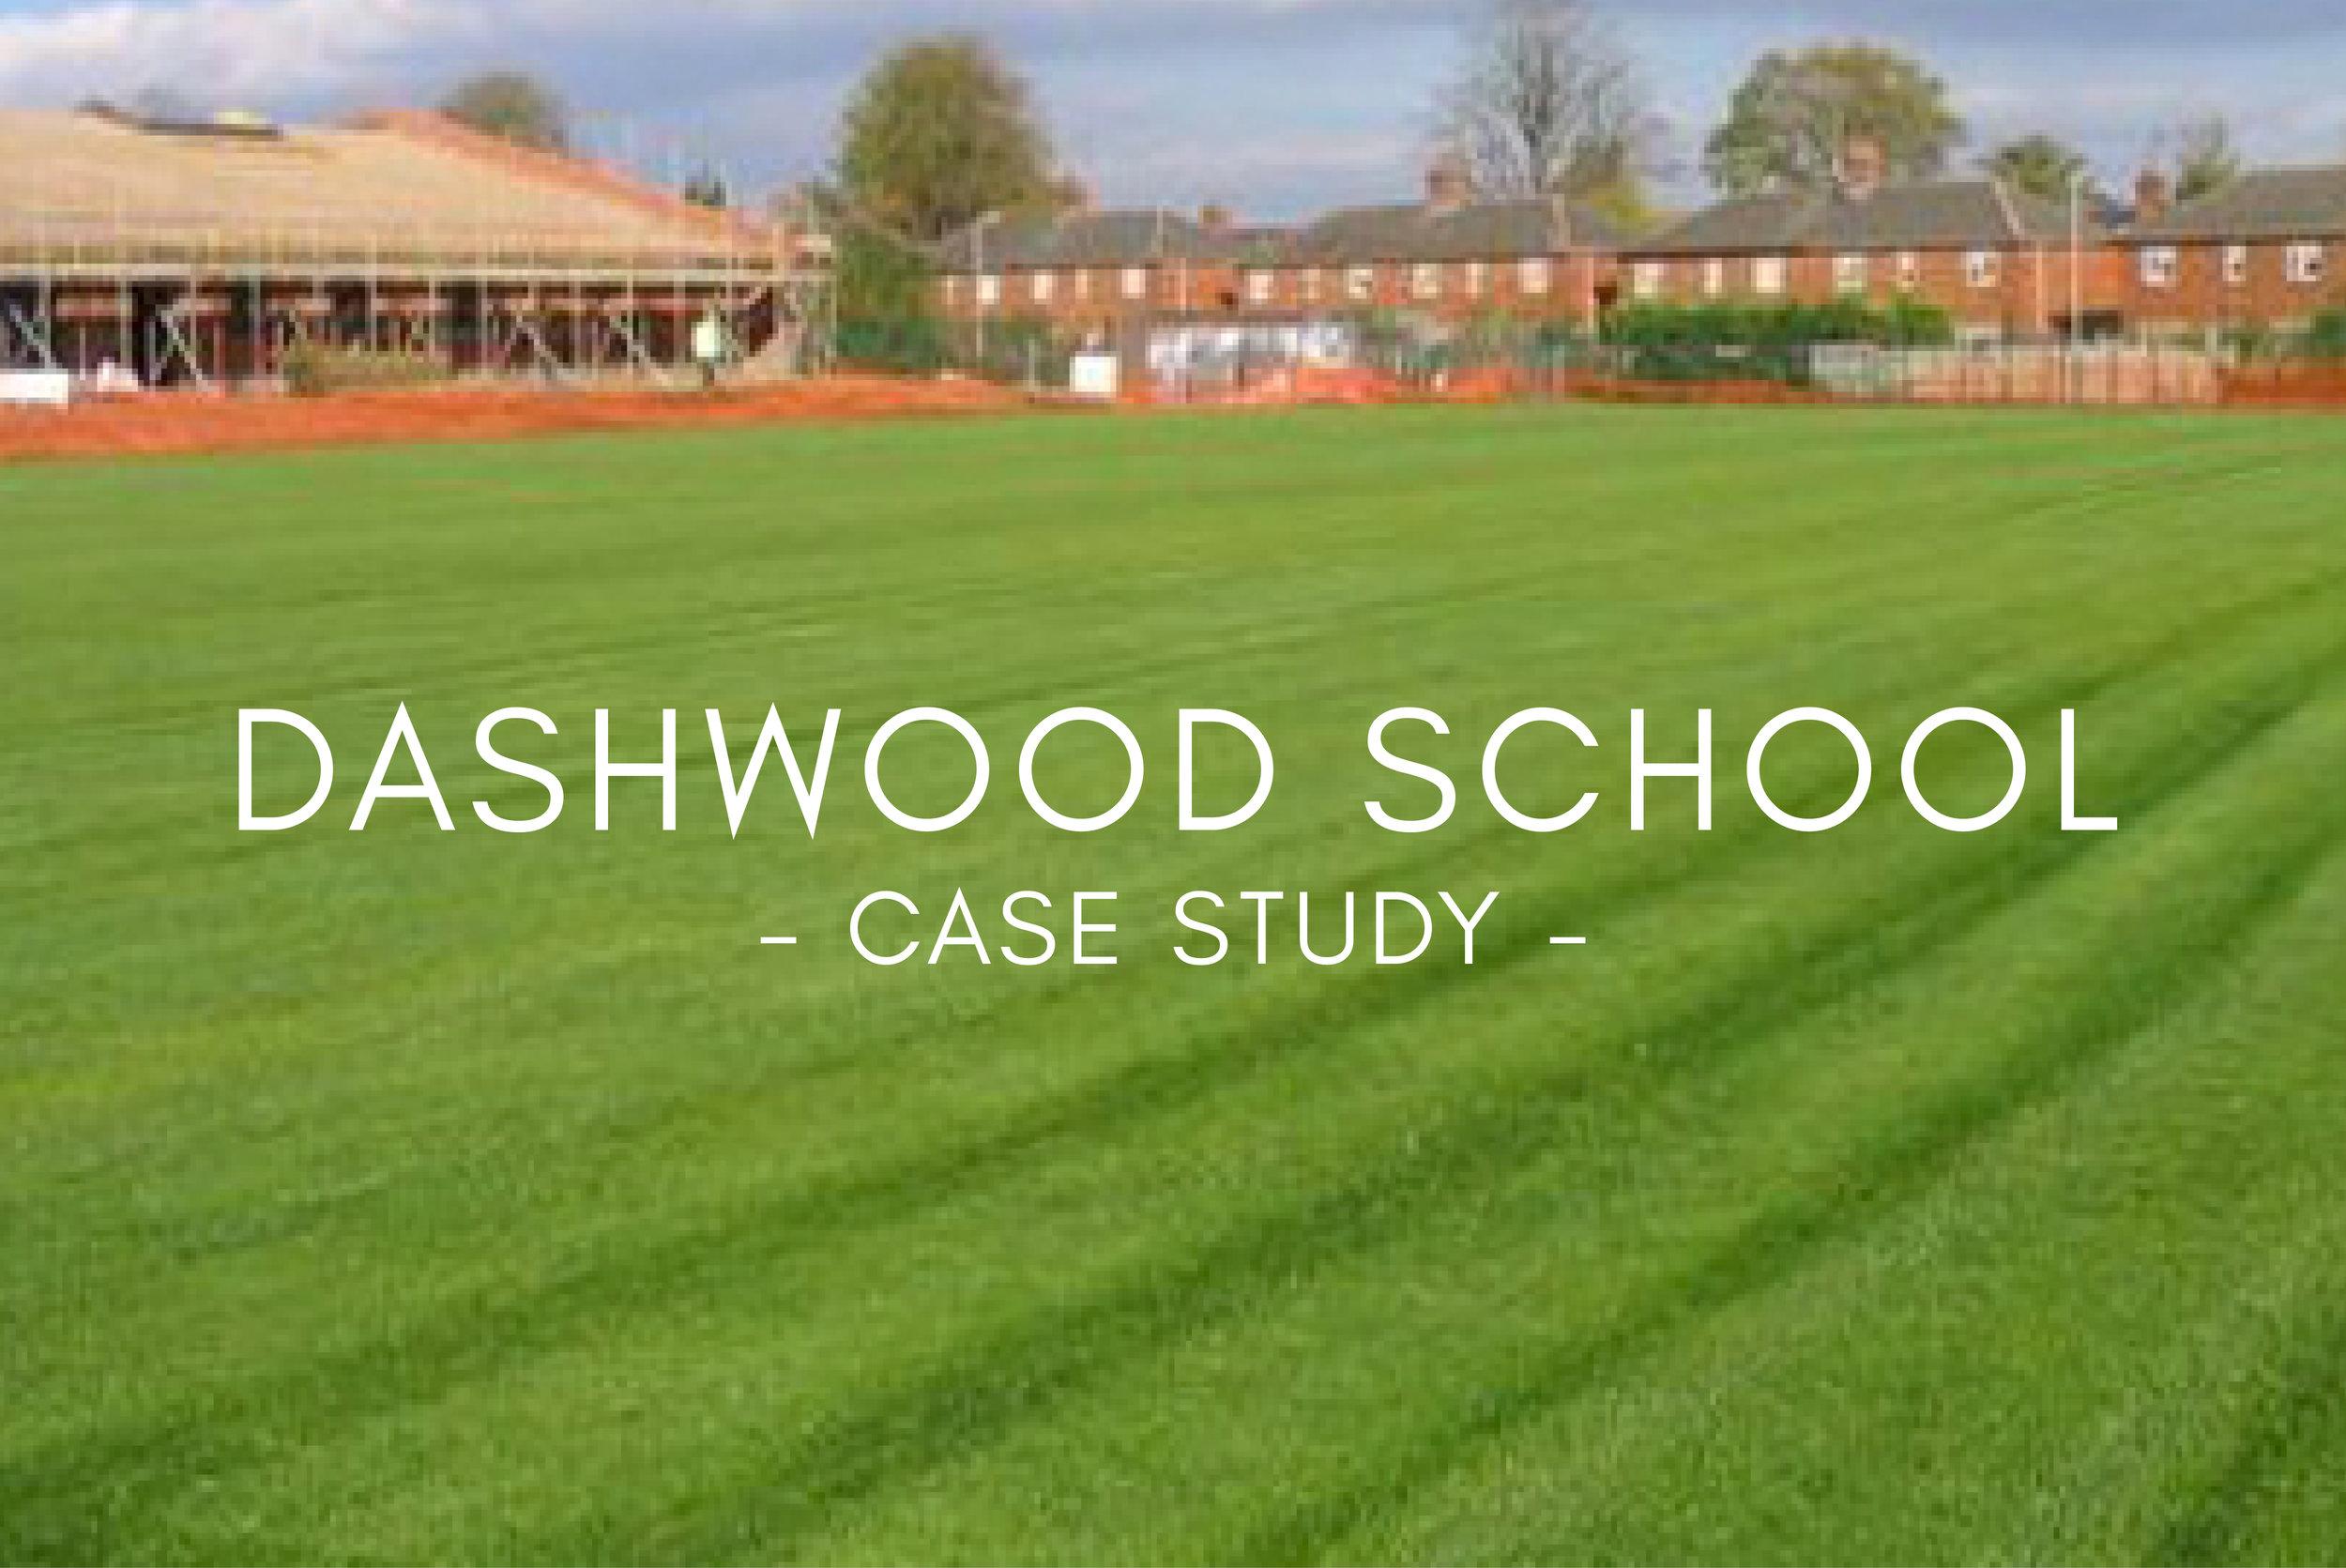 Portfolio - Dashwood School Sports Pitch Design & Construction